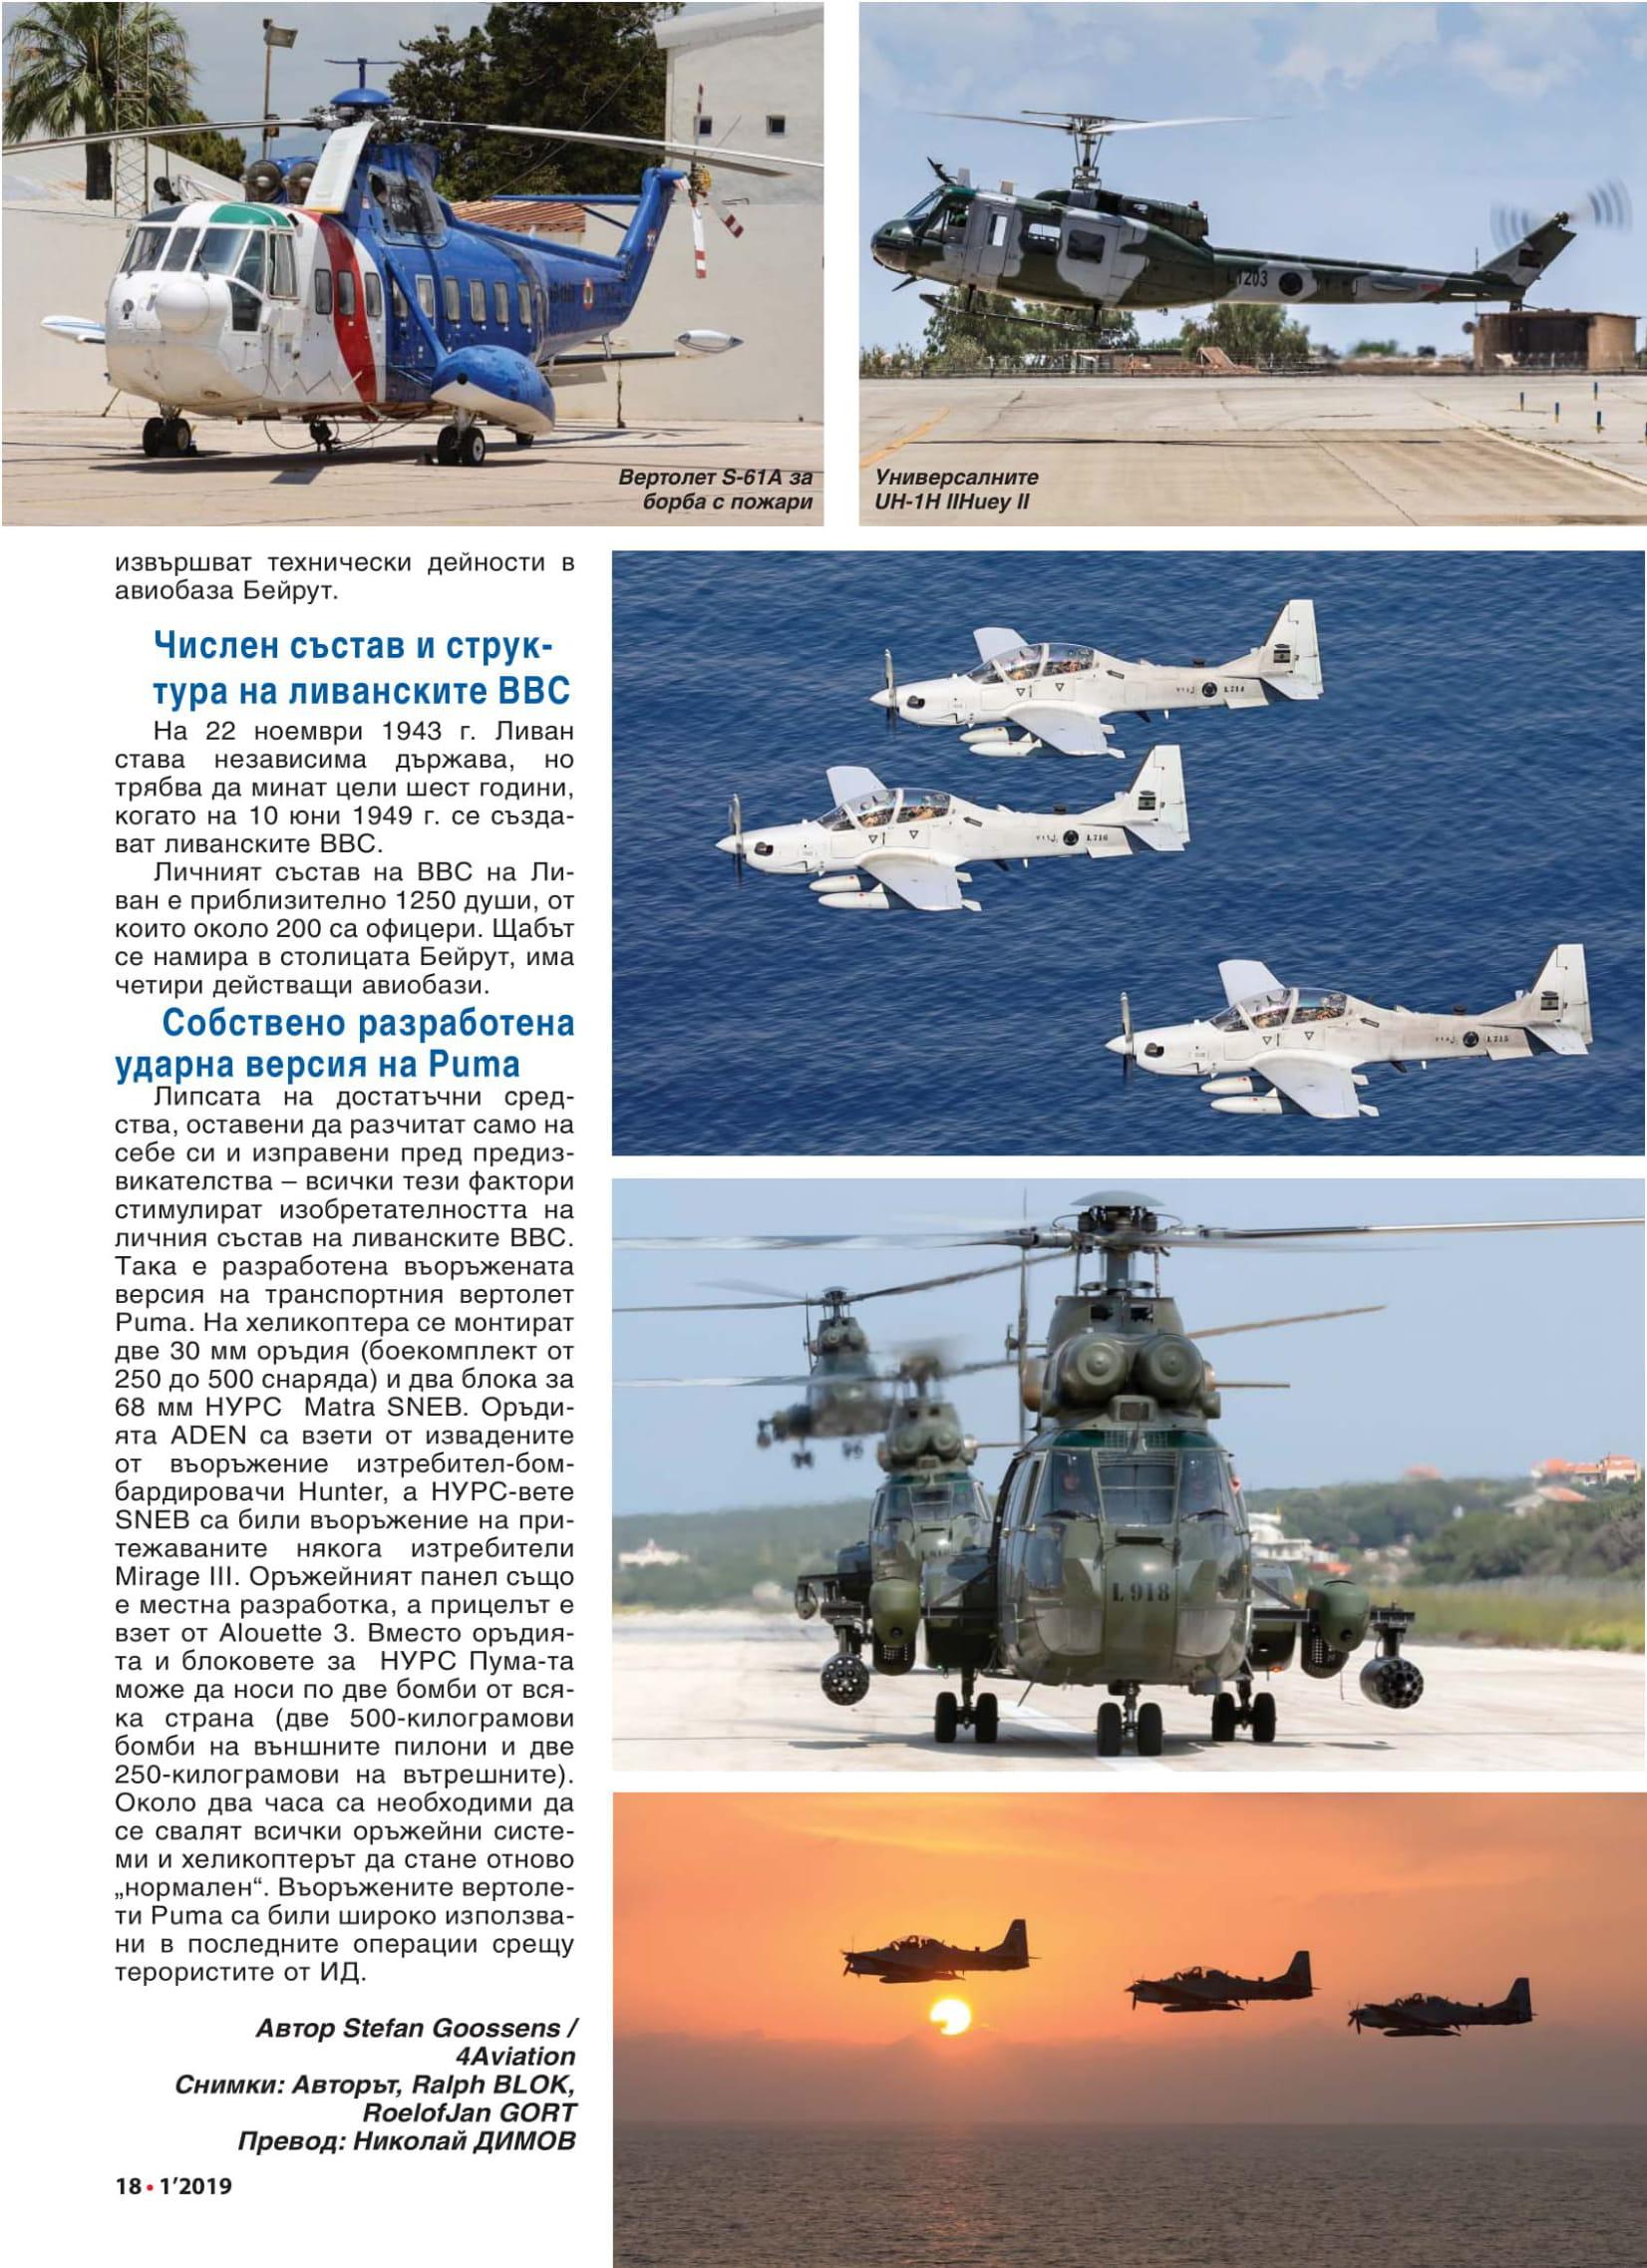 Club Wings (Bulgaria)_Lebanese Air Force (part 1)-4